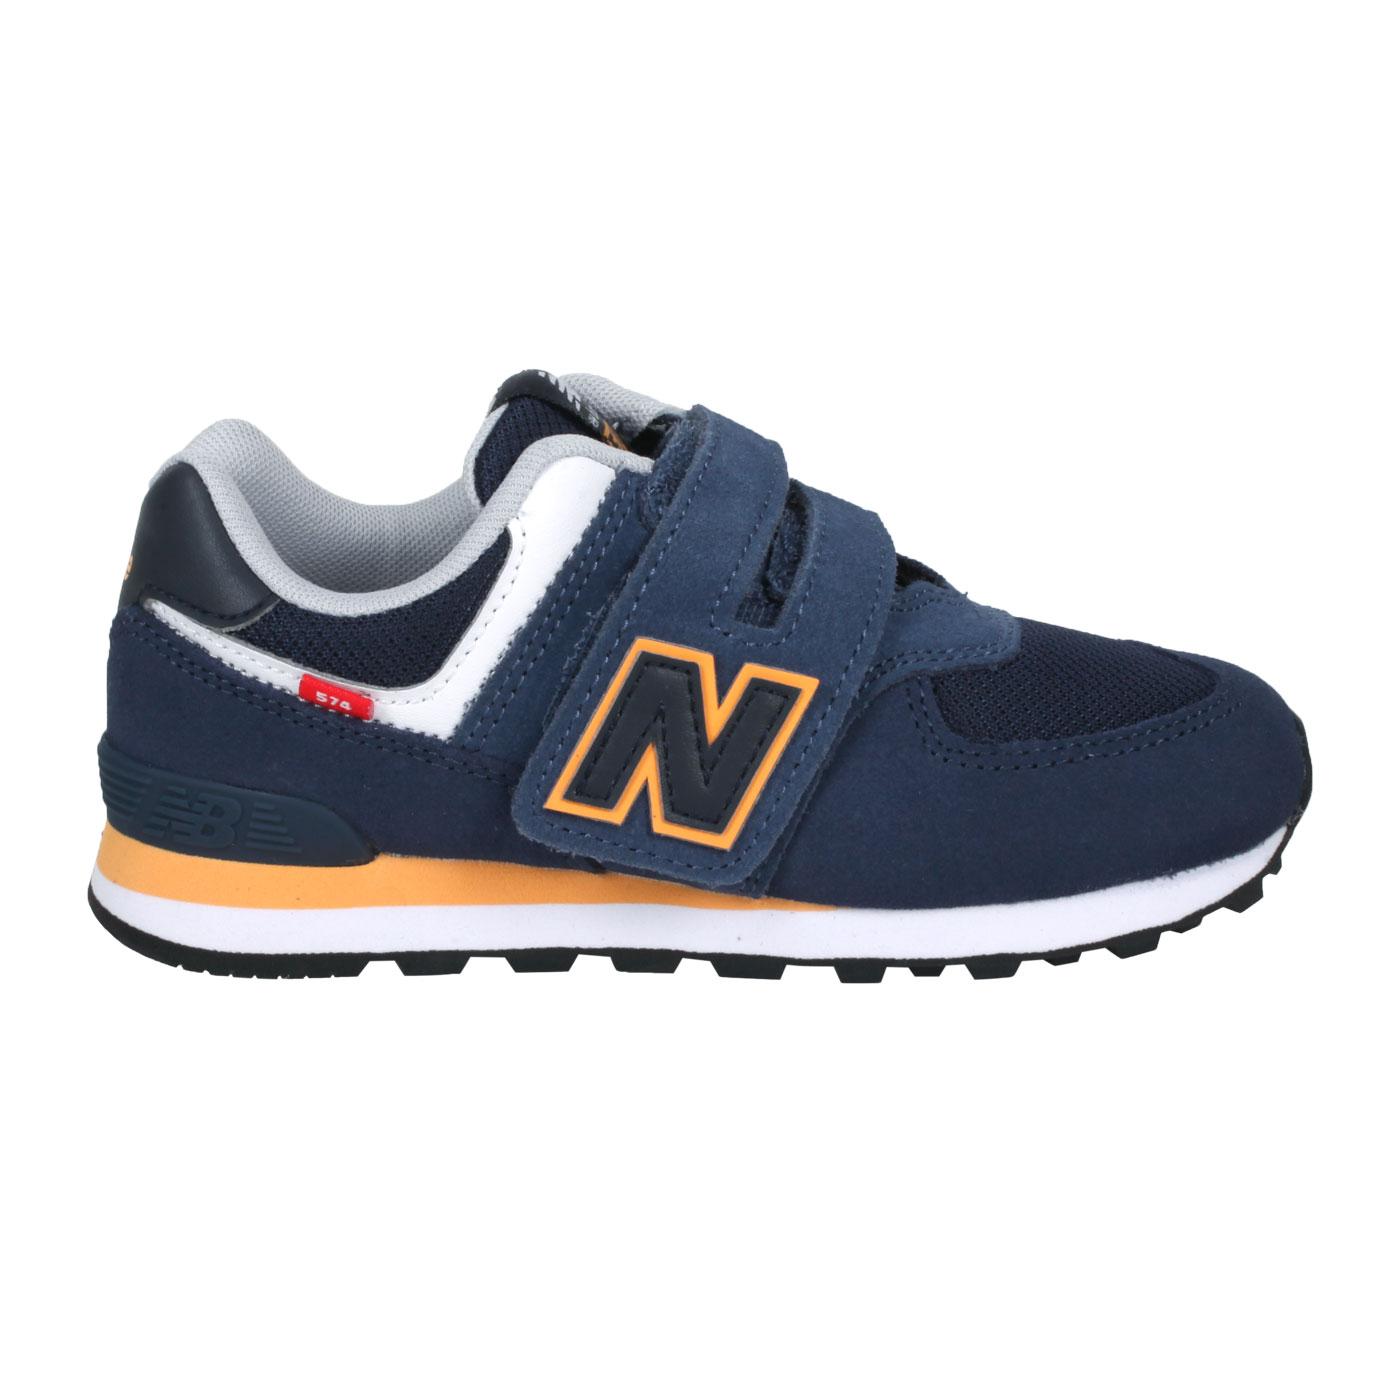 NEW BALANCE 中童休閒運動鞋-WIDE PV574SY2 - 丈青黃黑